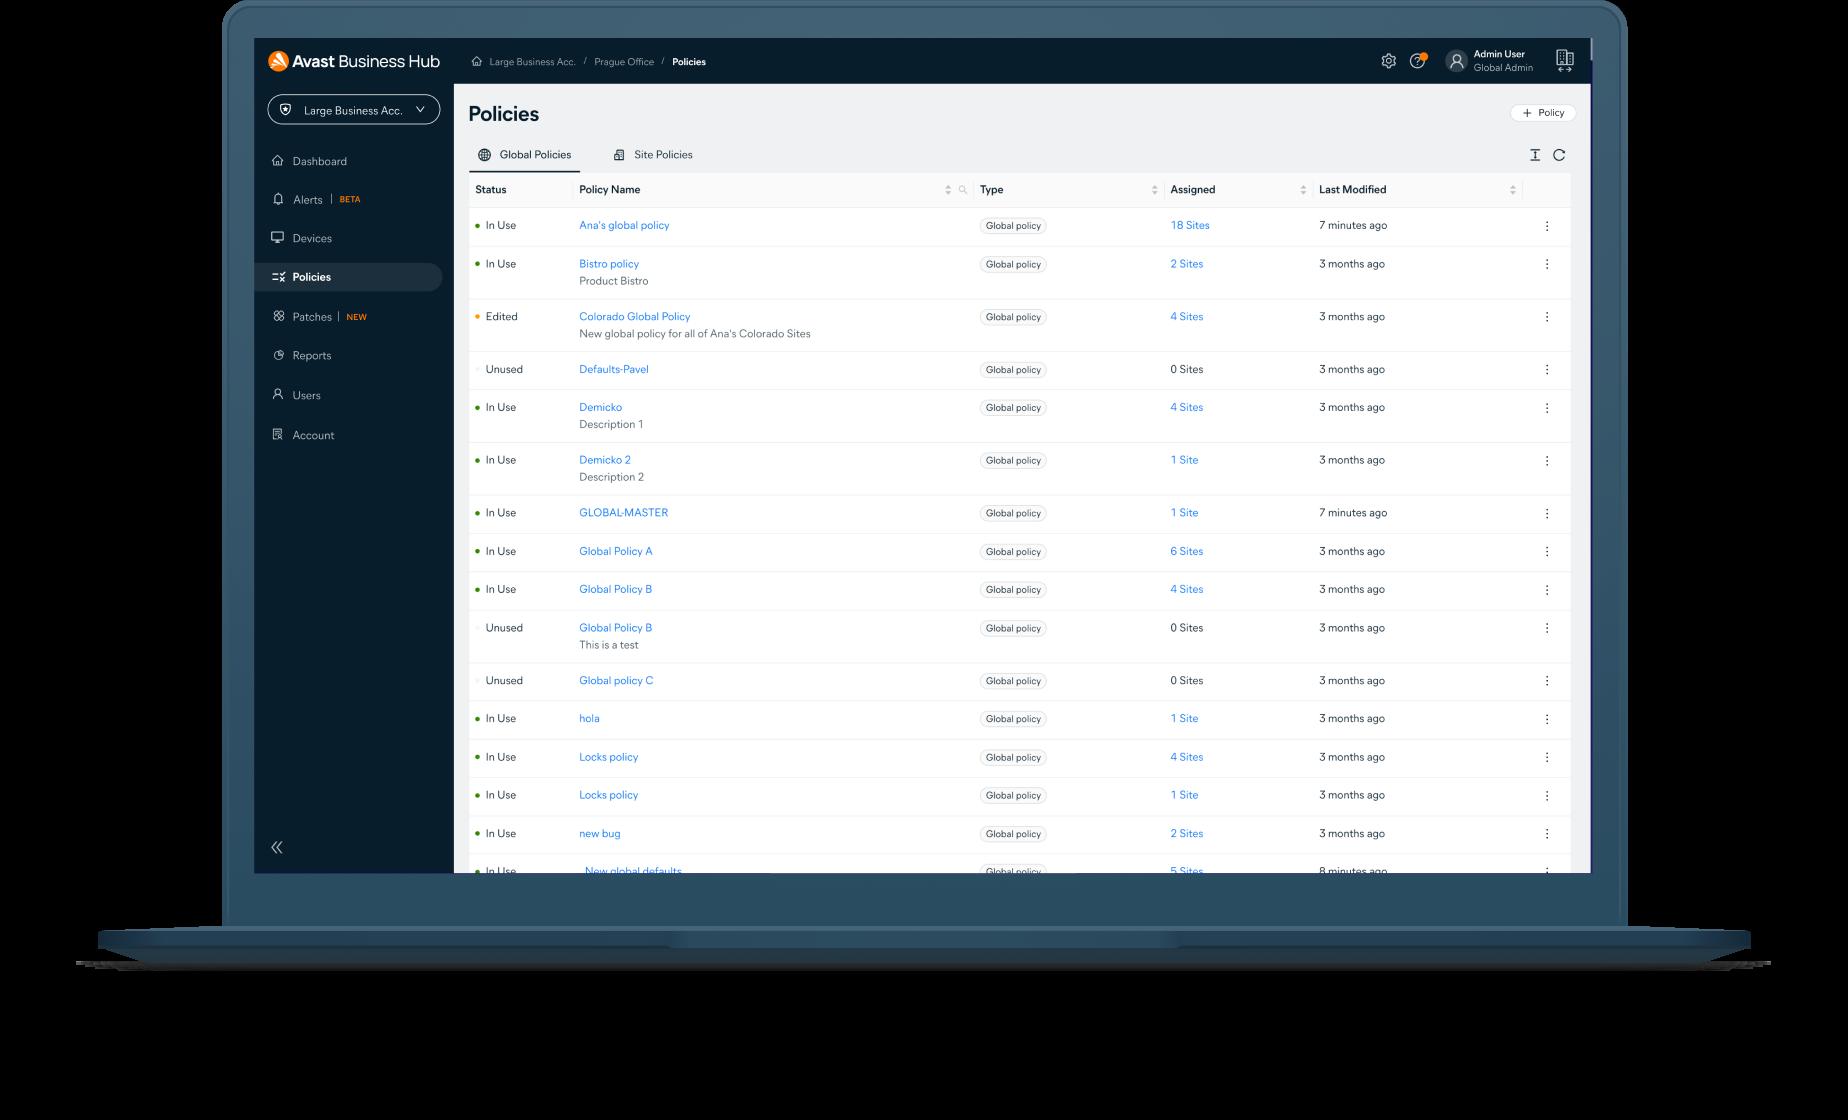 Windows Antivirus - Policies